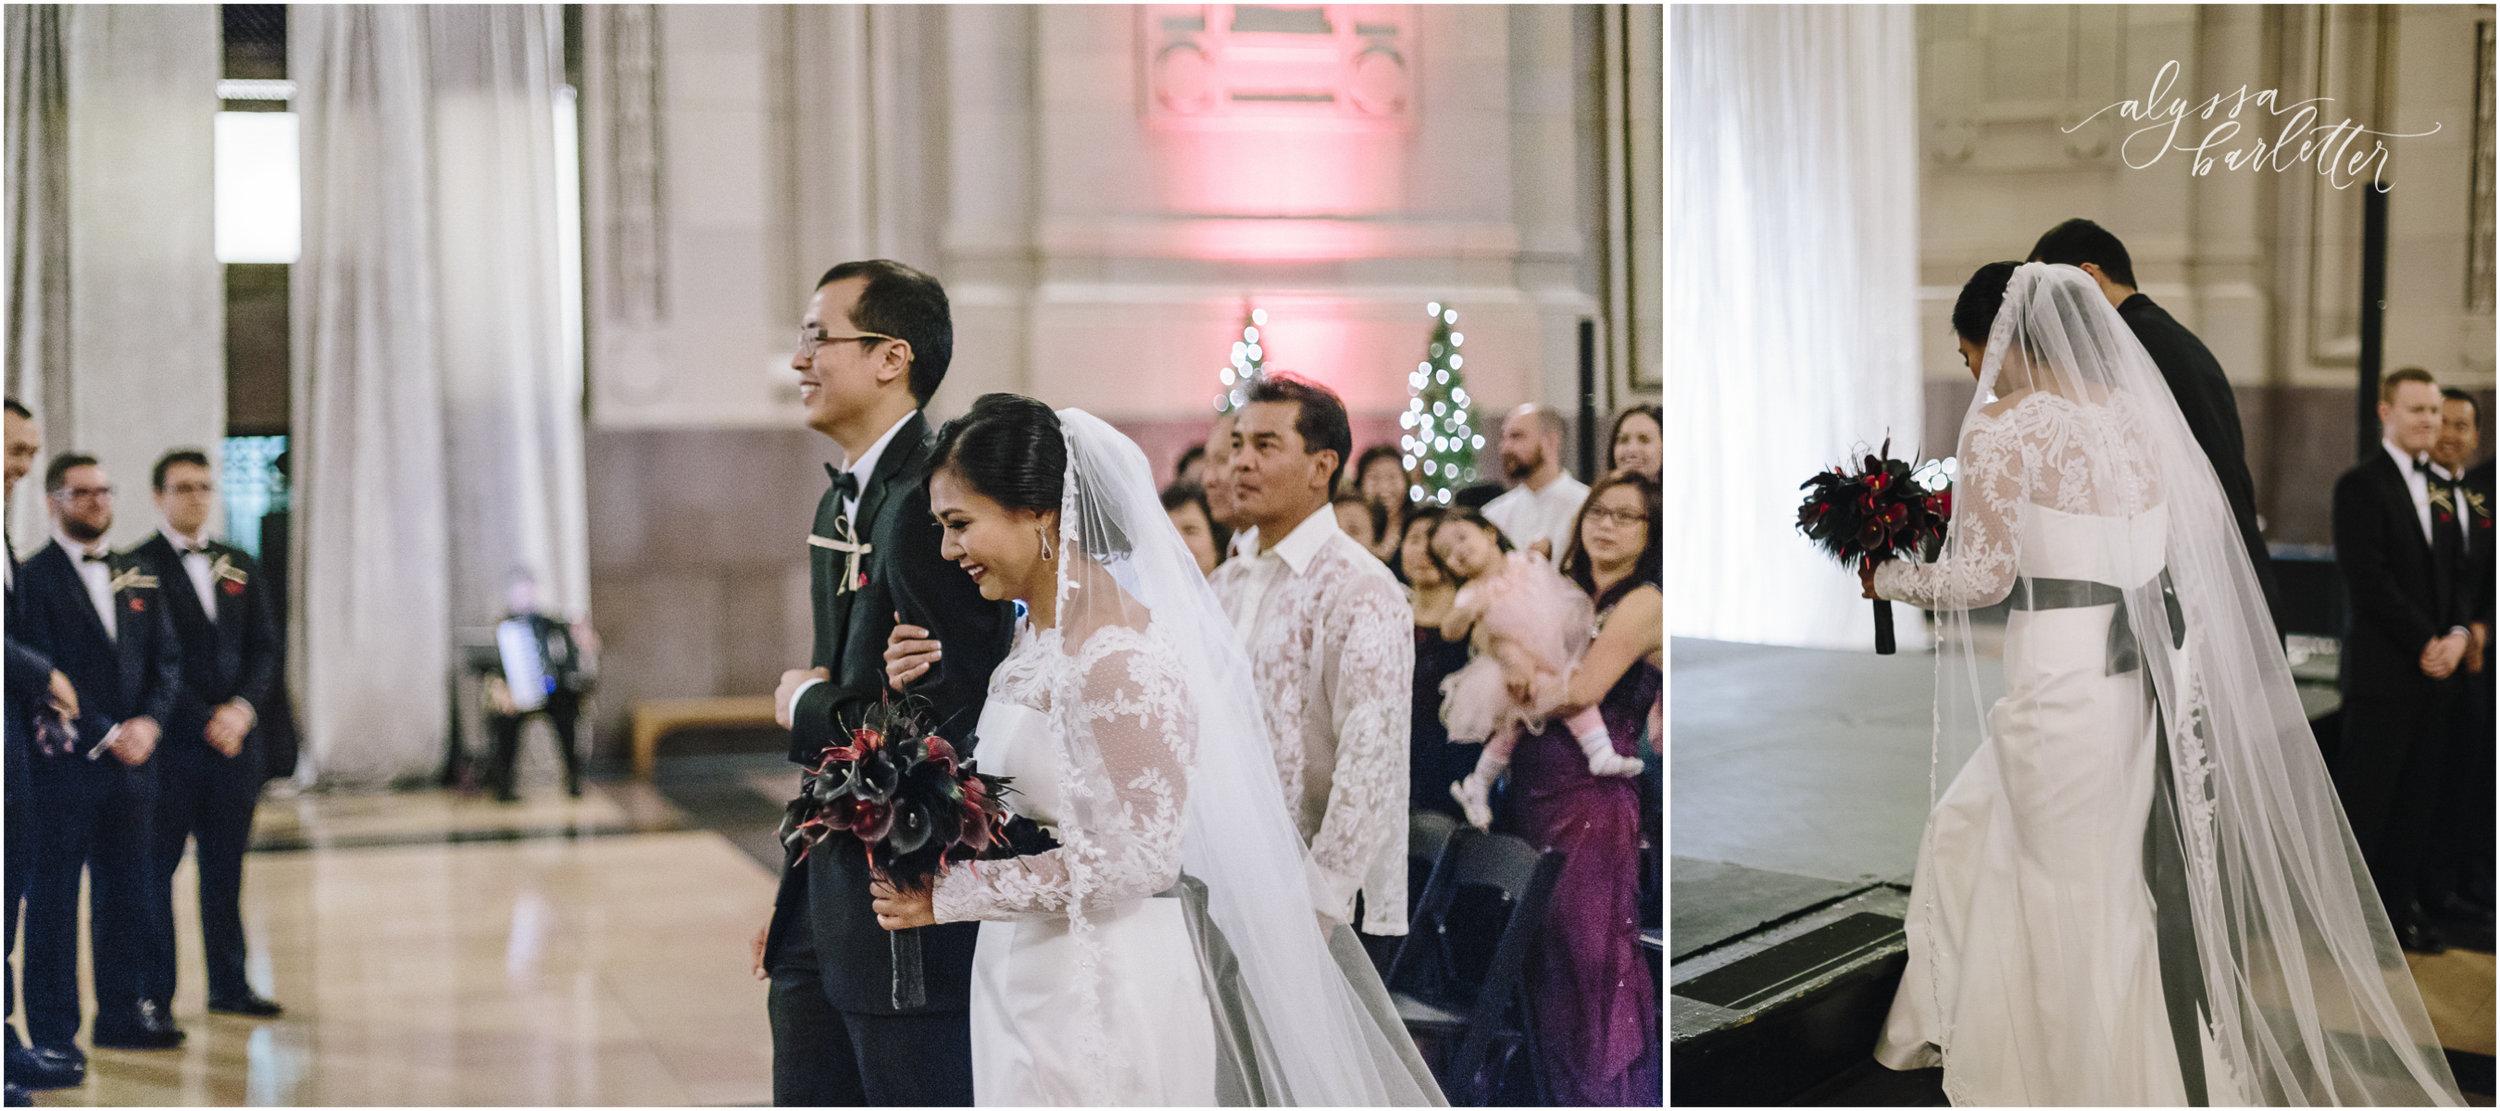 alyssa barletter photography union station wedding photos leopard print winter wedding-1-40.jpg